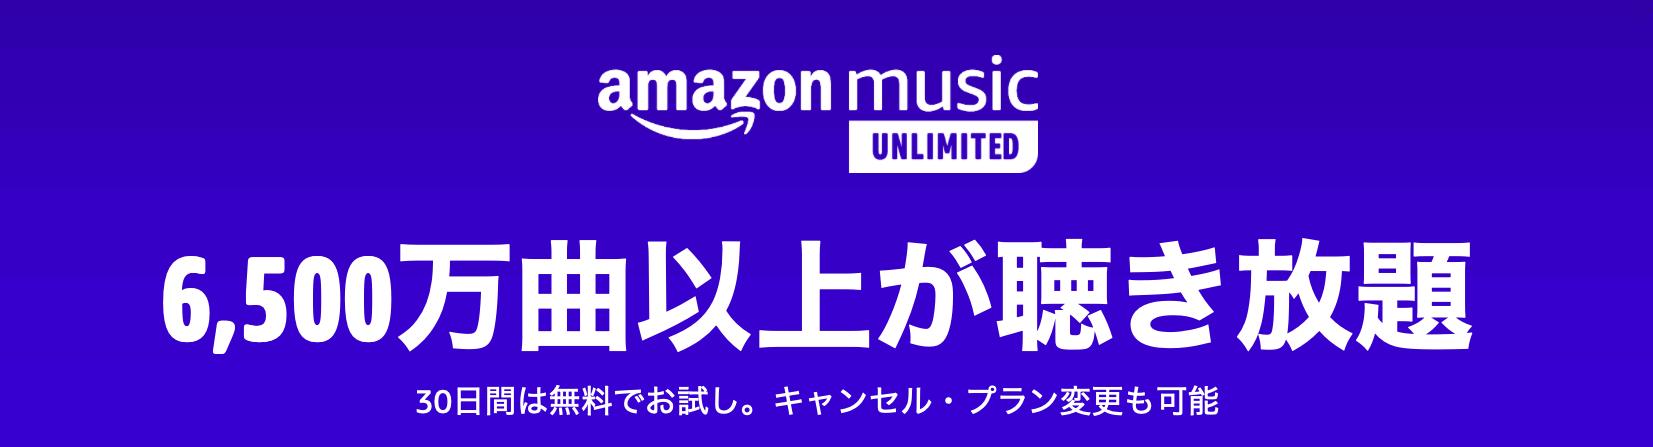 amazonmusic unlimited おすすめ